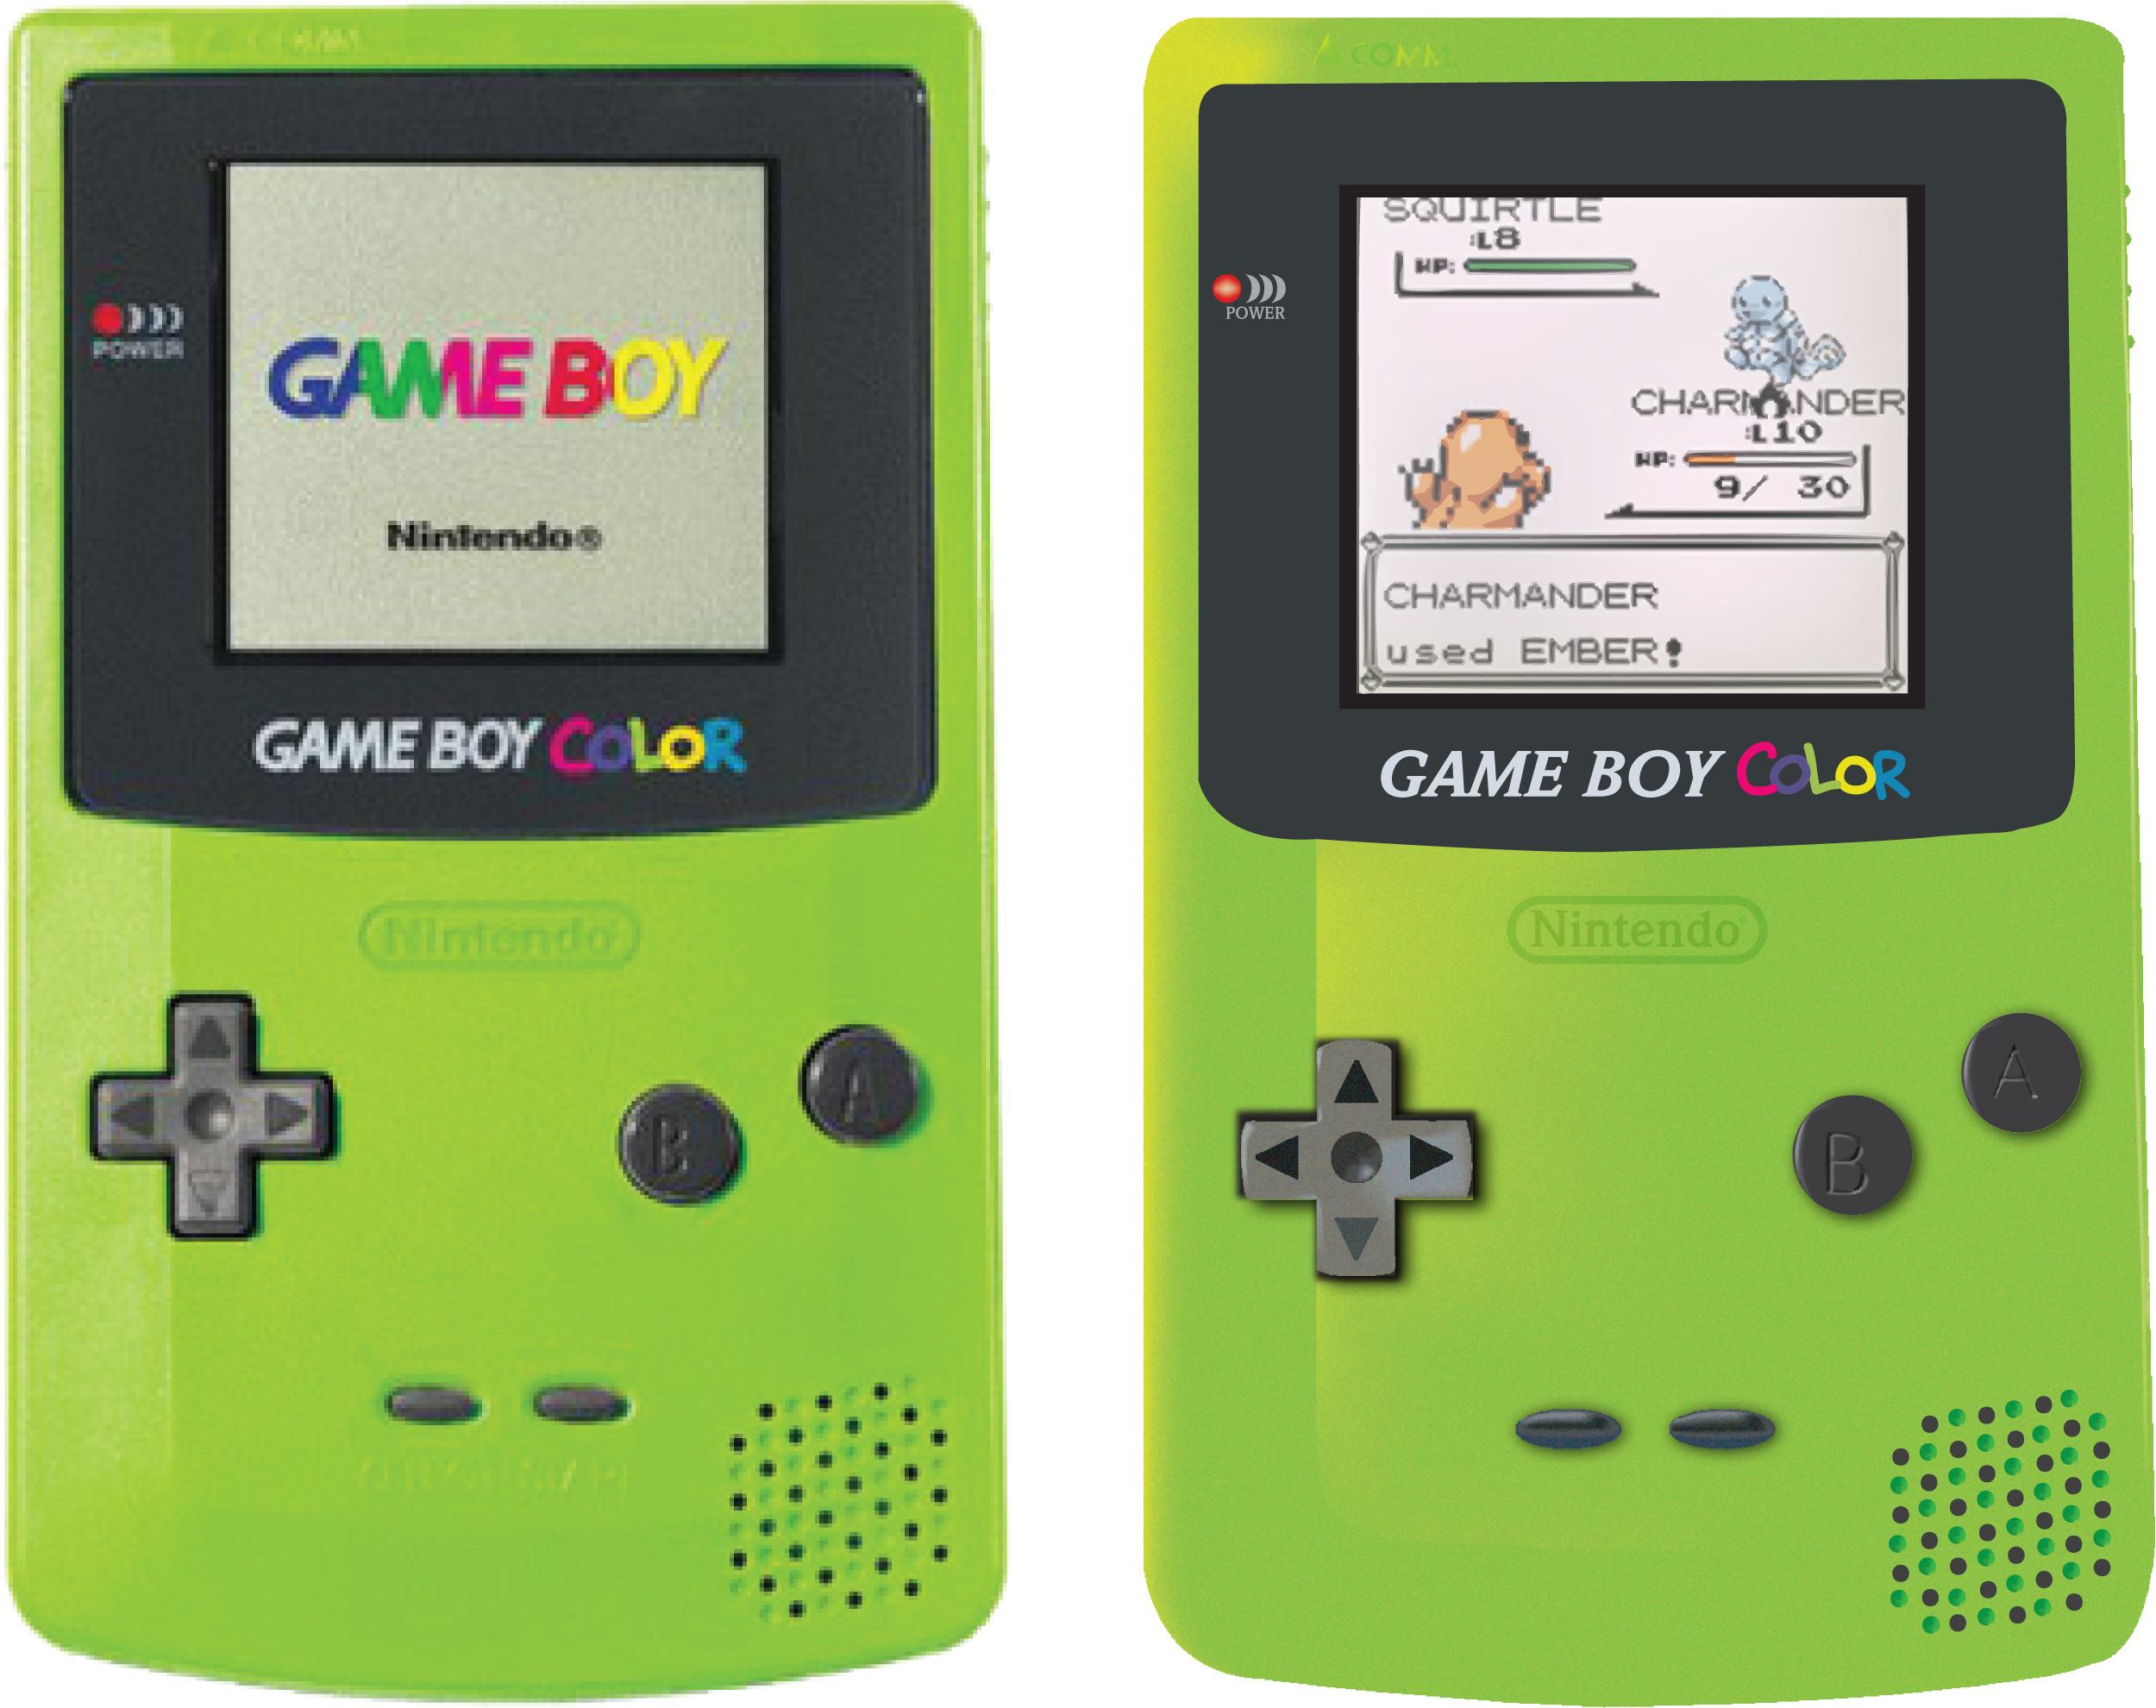 1998 Nintendo Game Boy Color Kiwi Green Handheld System On